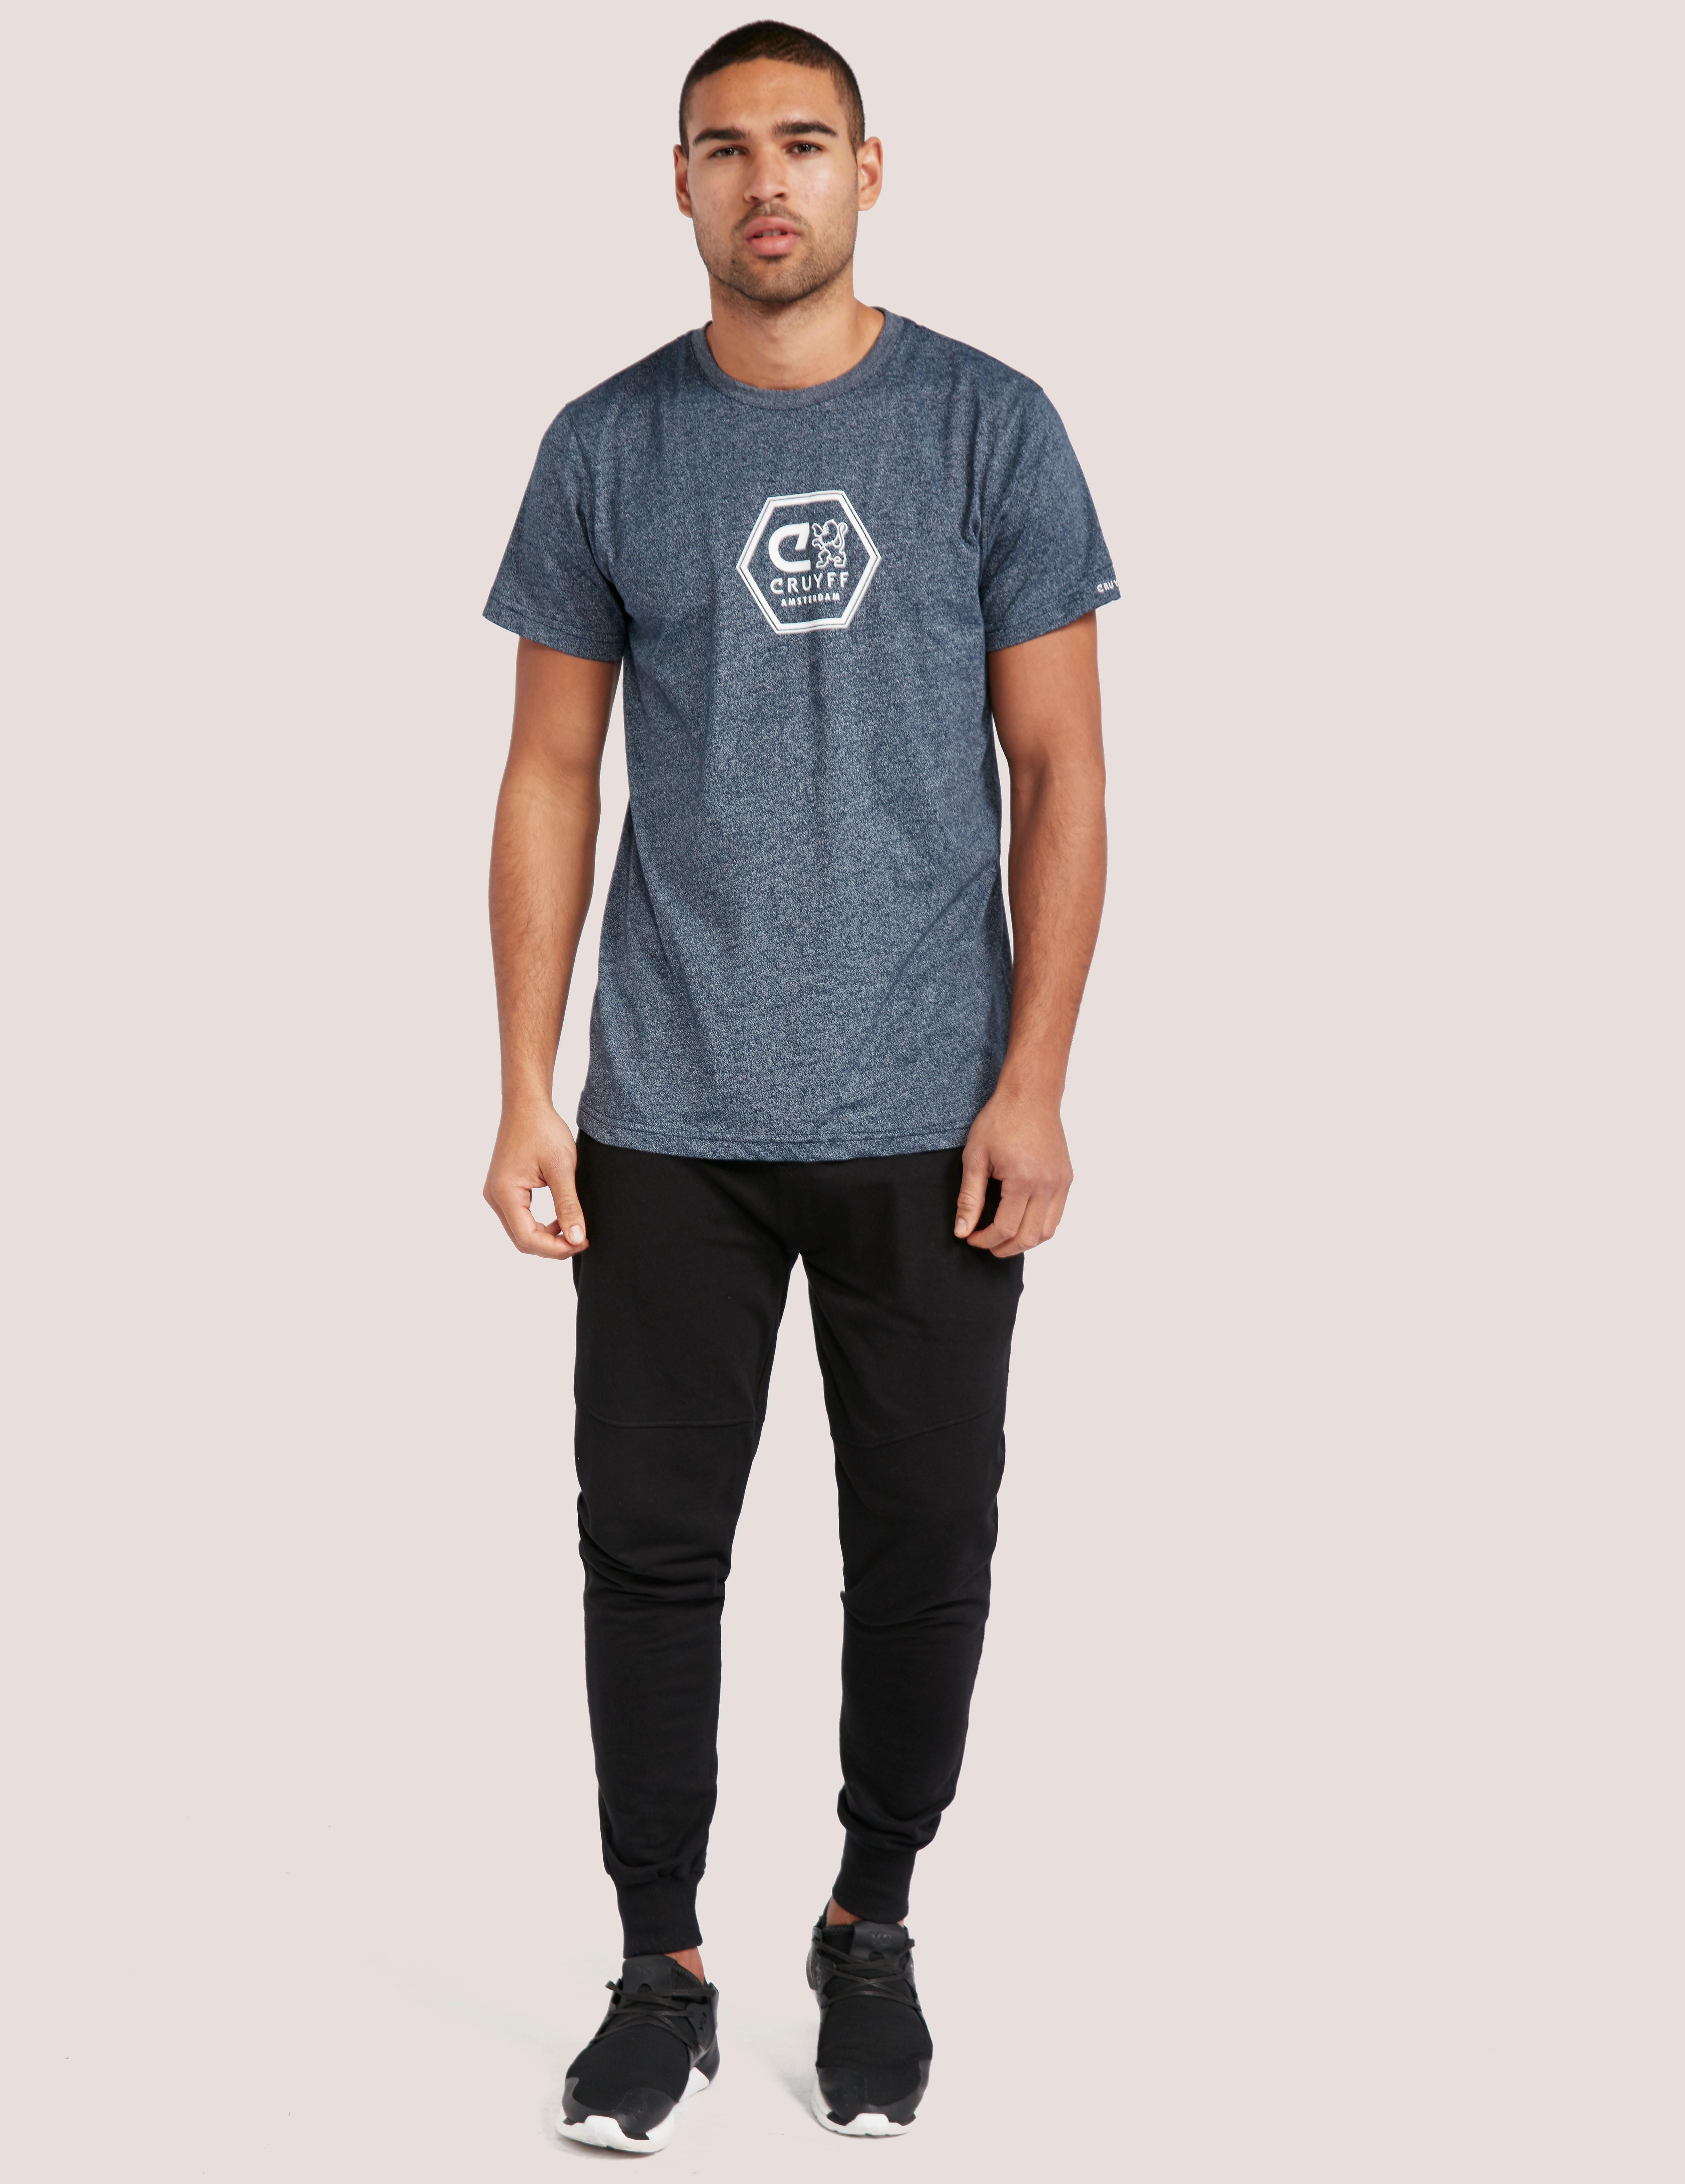 Cruyff Tete Hex Logo T-Shirt